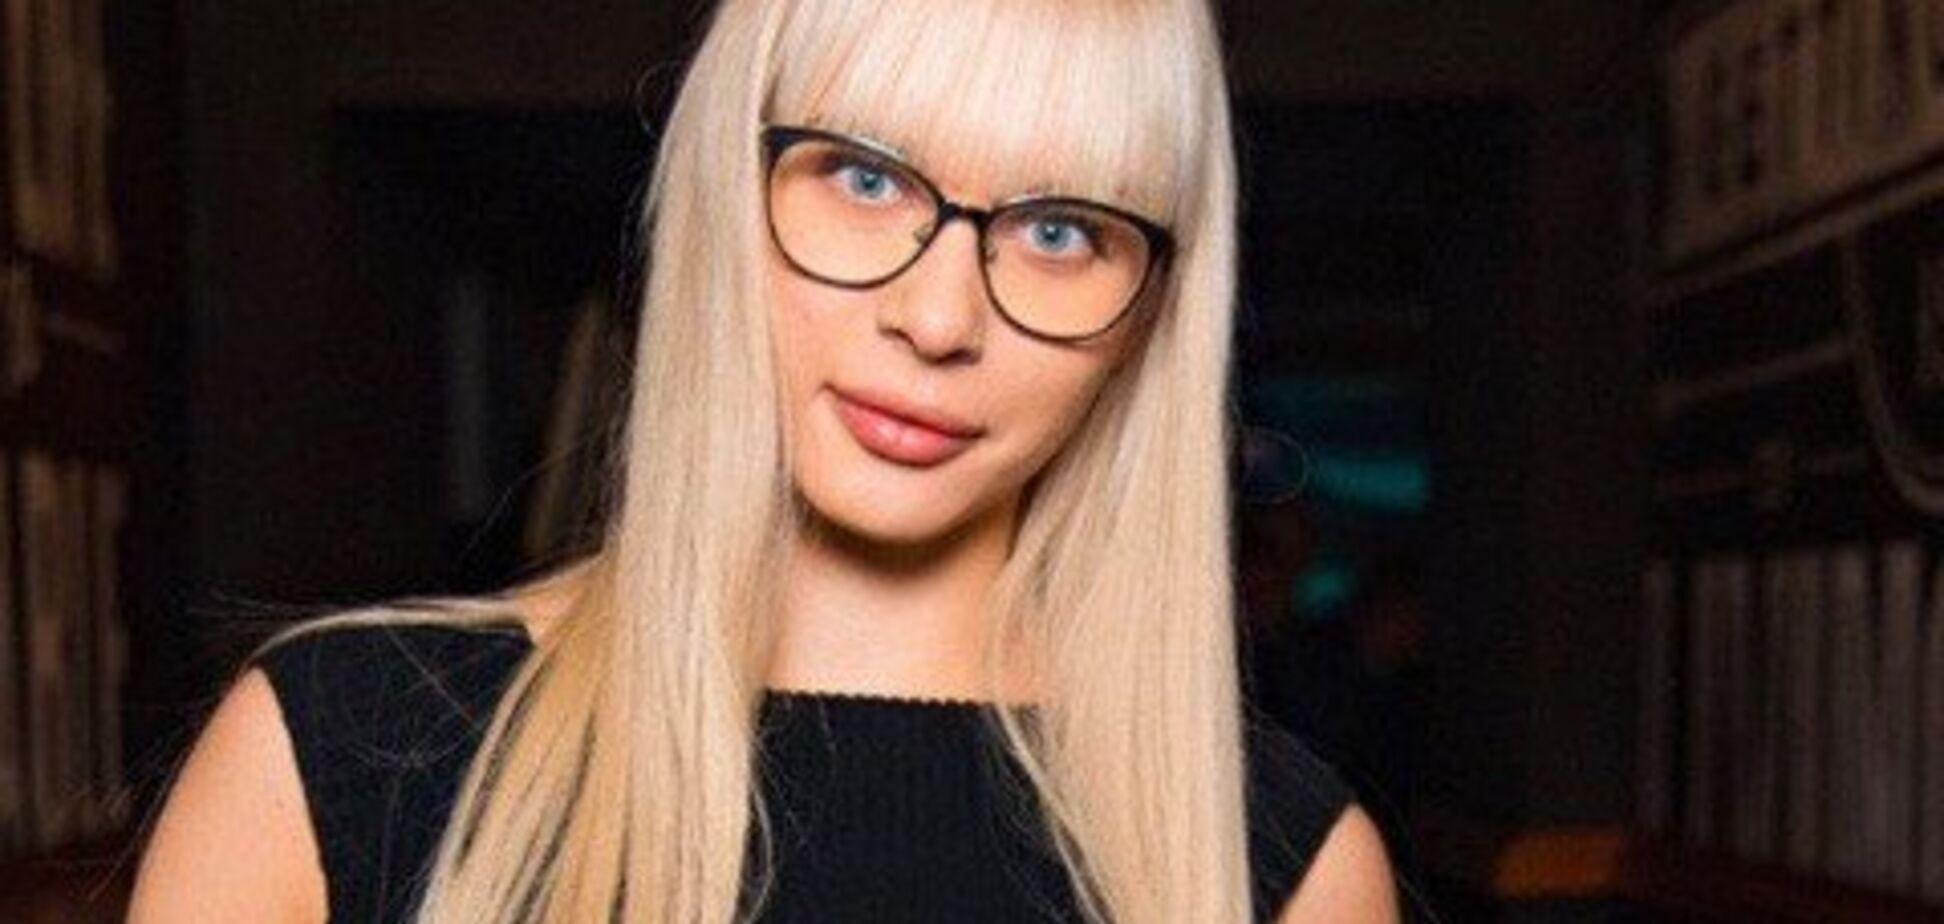 ''Жутко болели голова и низ живота'': звезда шоу ''Дом-2'' заявила об изнасиловании